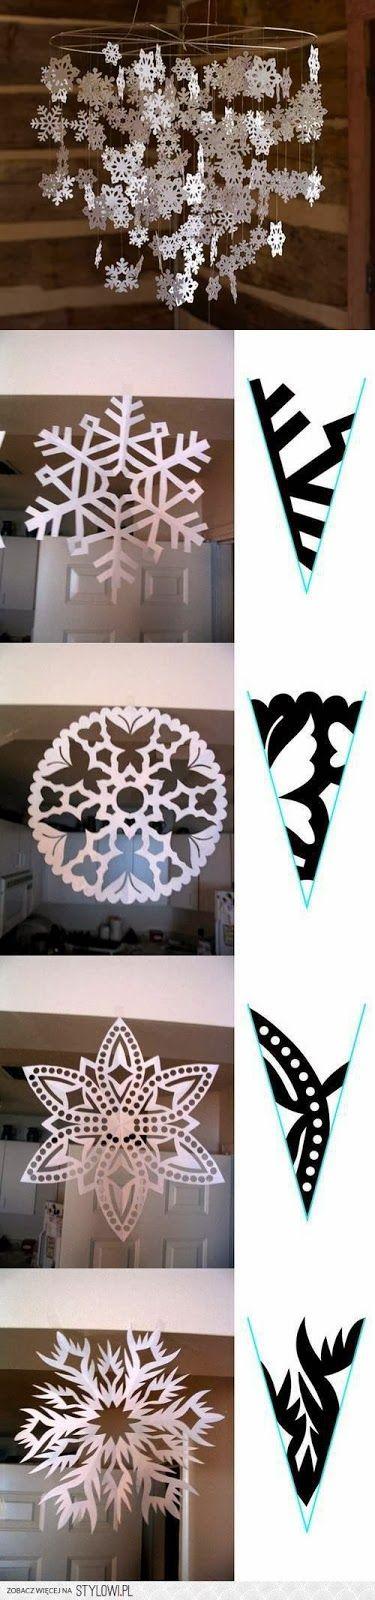 stylowi_pl_diy-zrob-to-sam_diy-snowflake-paper-pattern-diy-projects--usefuldi_14131009.jpg (375×1600)